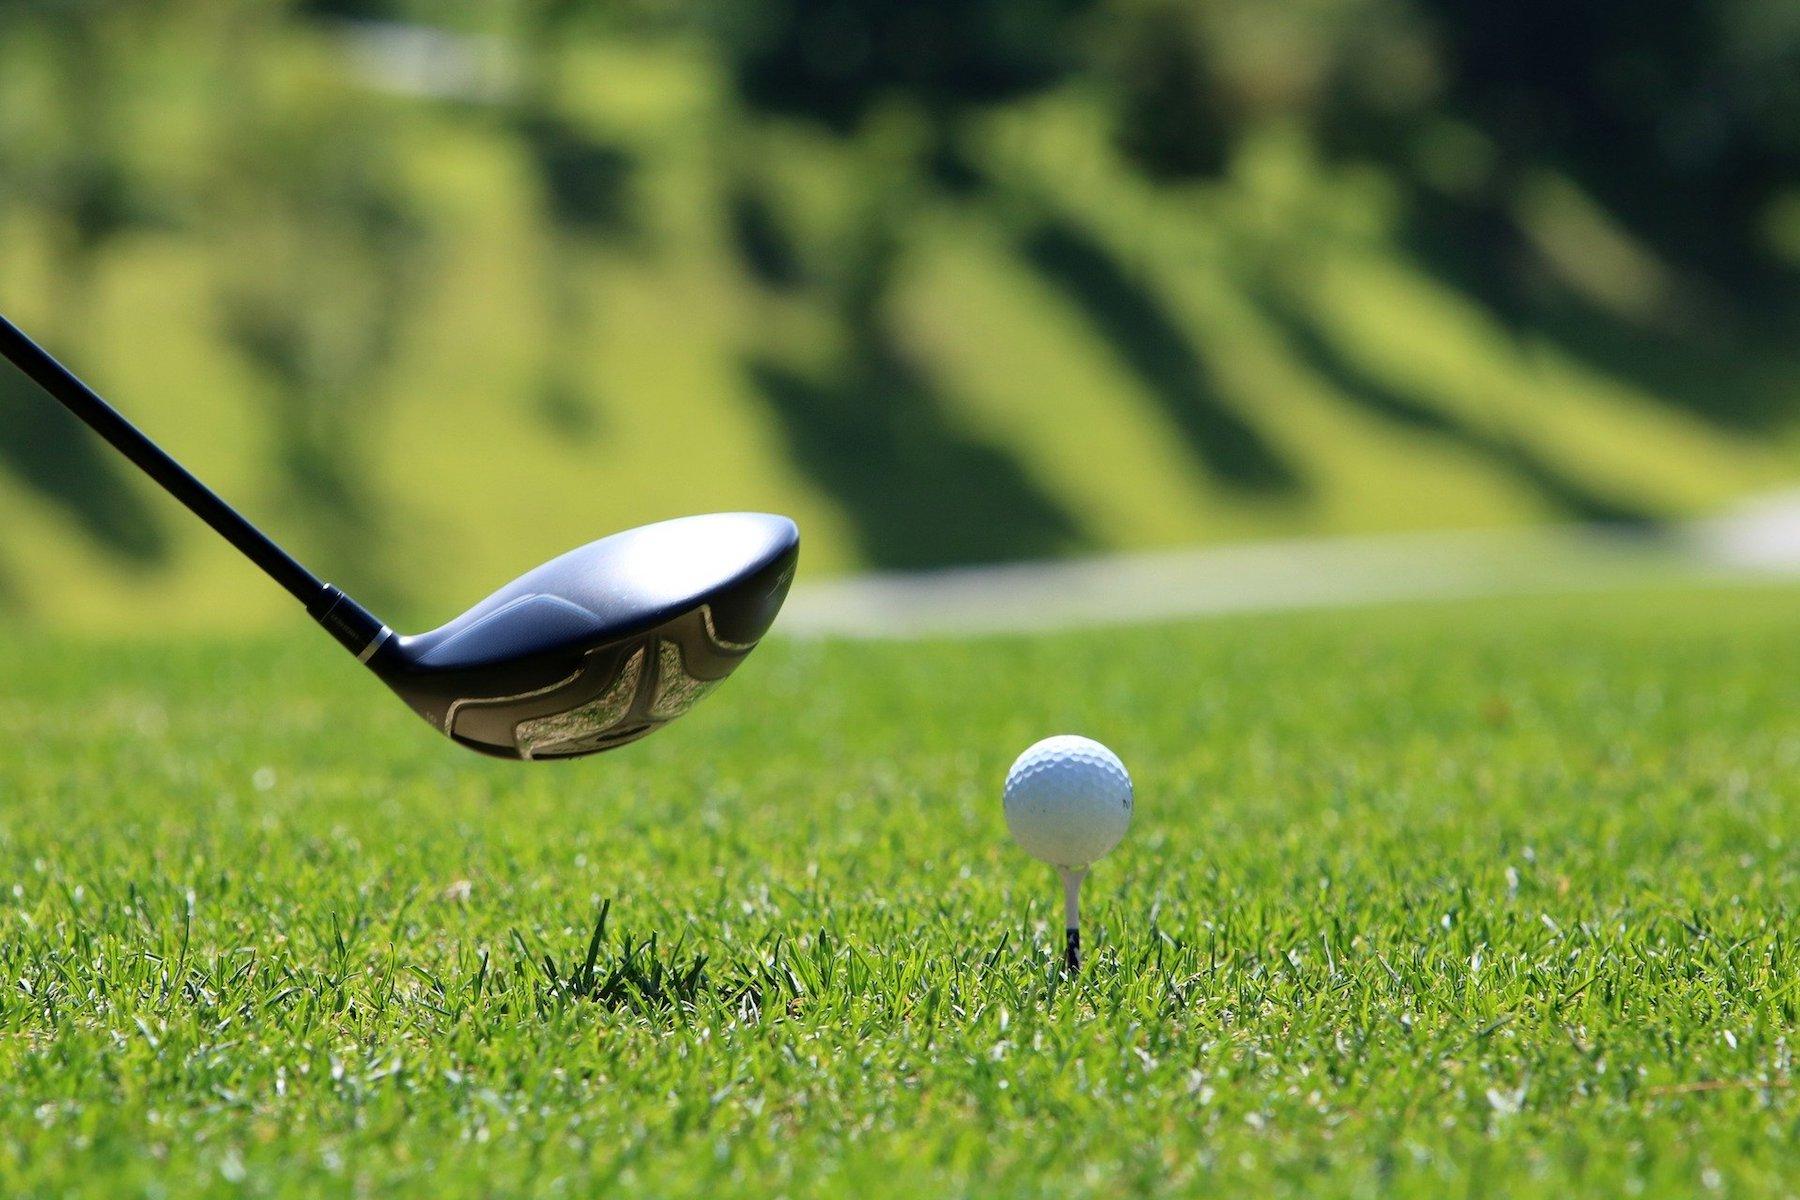 golf-3685616 1920